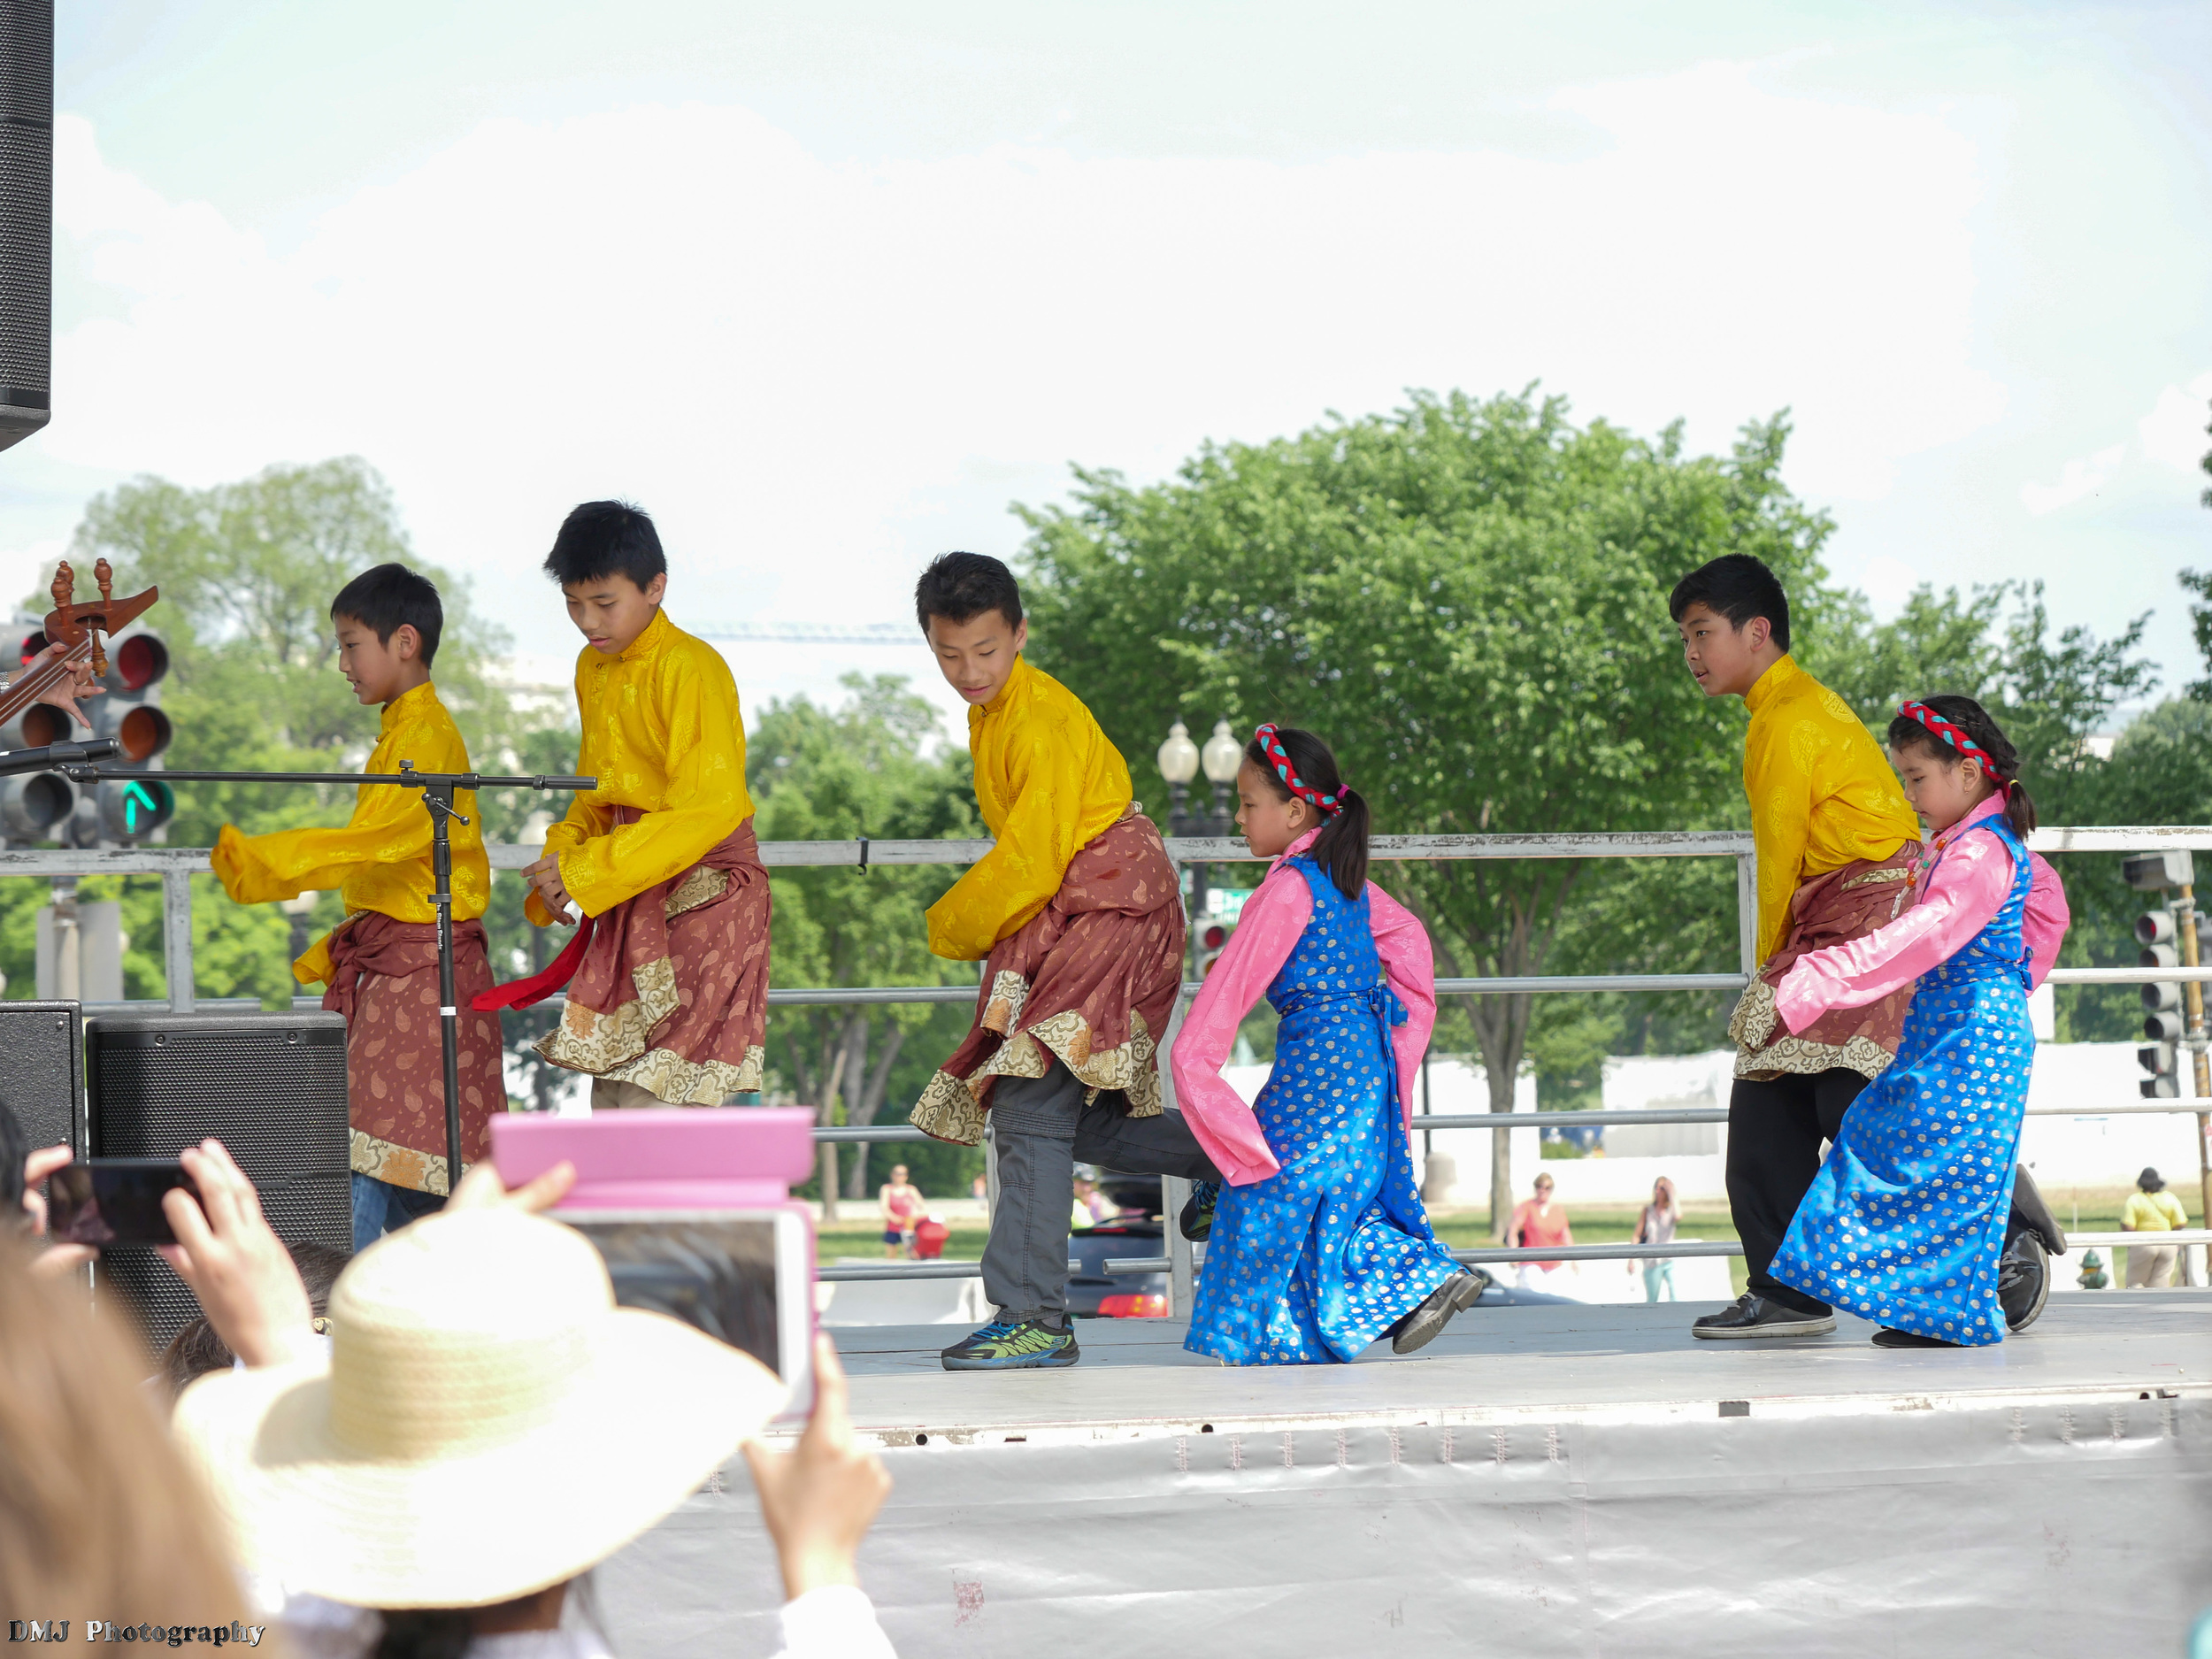 fiesta_asia_street_festival_2015_cultural_stage_02.jpg